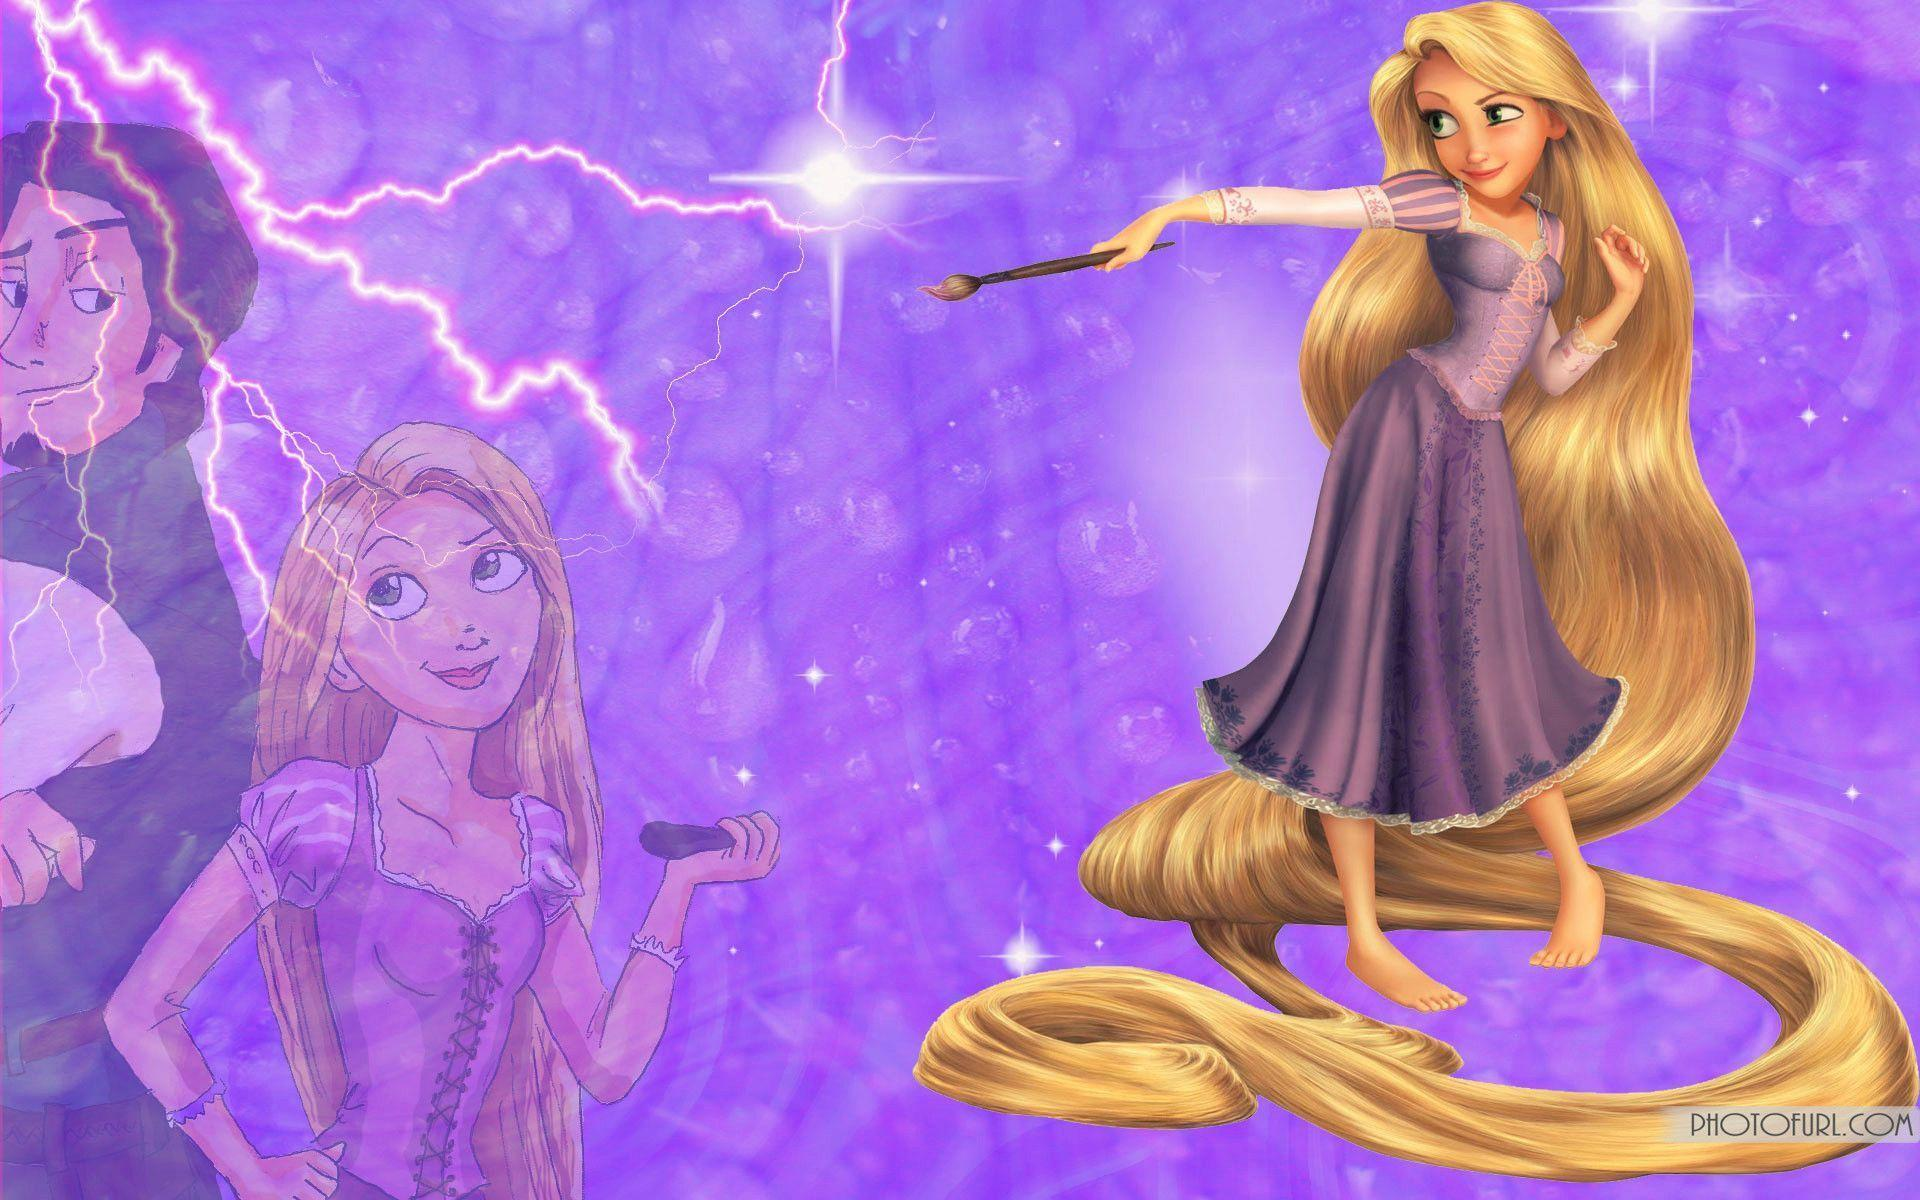 Rapunzel Wallpapers Top Free Rapunzel Backgrounds Wallpaperaccess